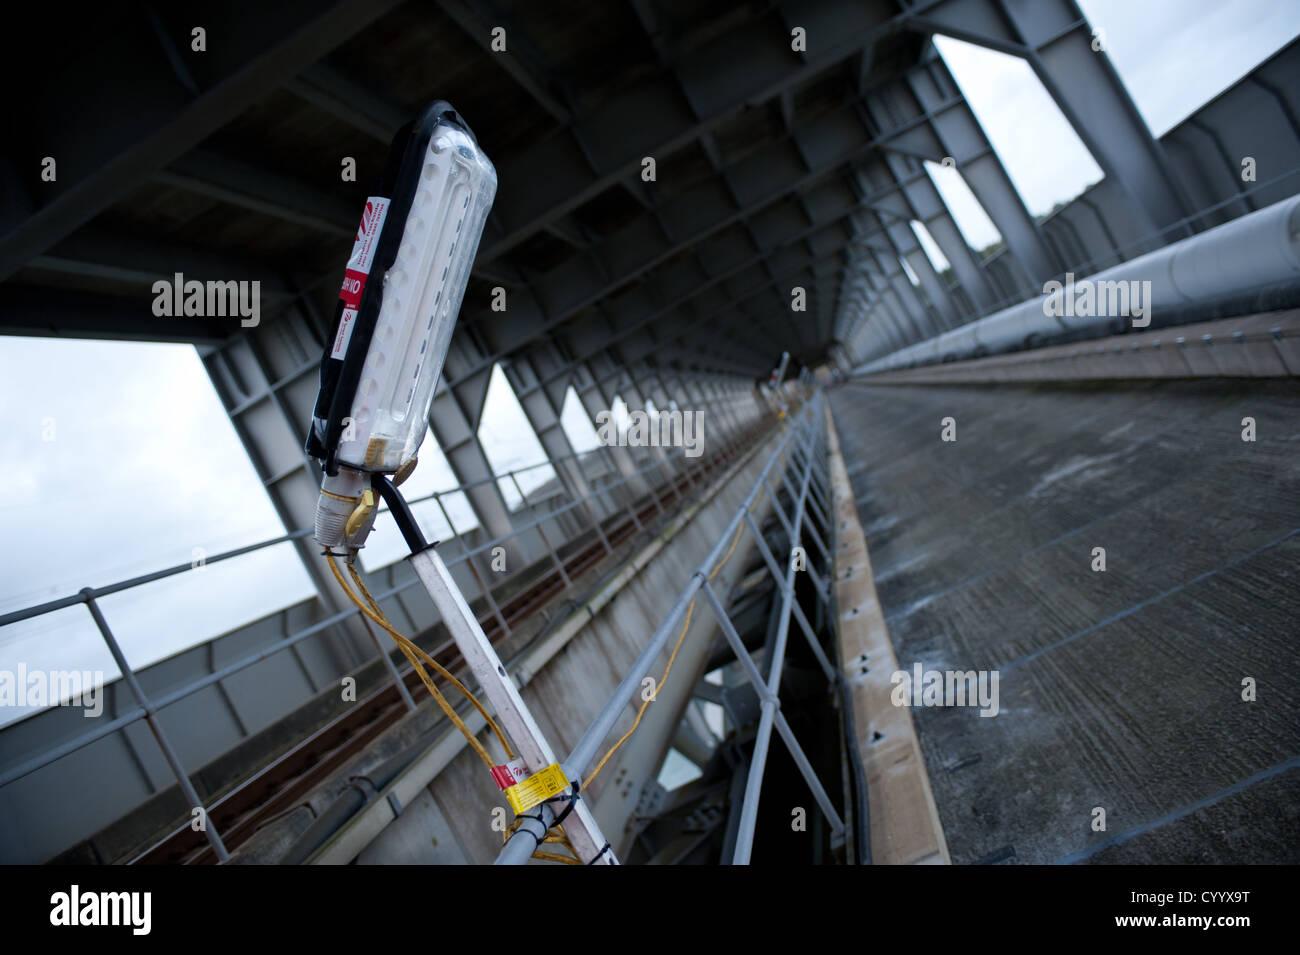 A service road site lighting, trackside in the Britannia railway bridge, Wales Stock Photo